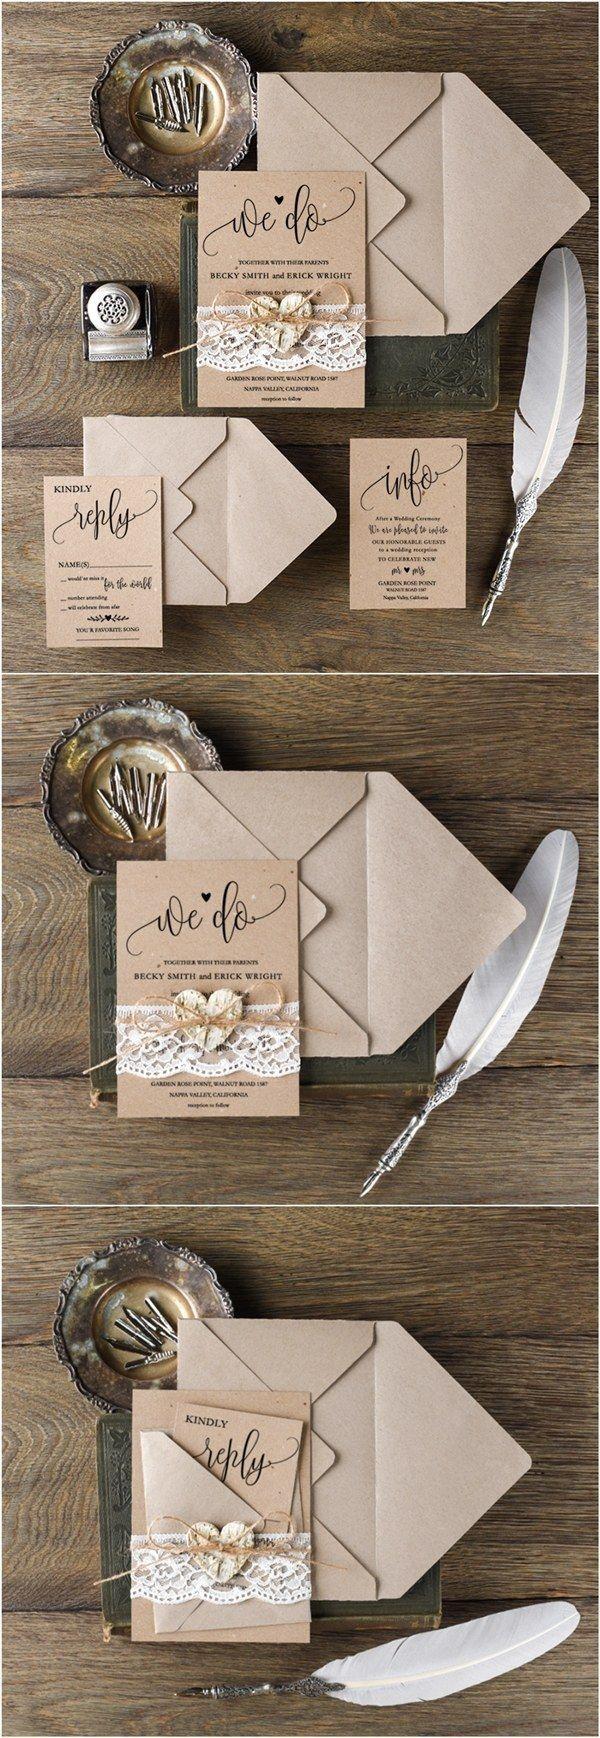 invitations to wedding%0A Rustic wedding invitations from  lovepolkadots